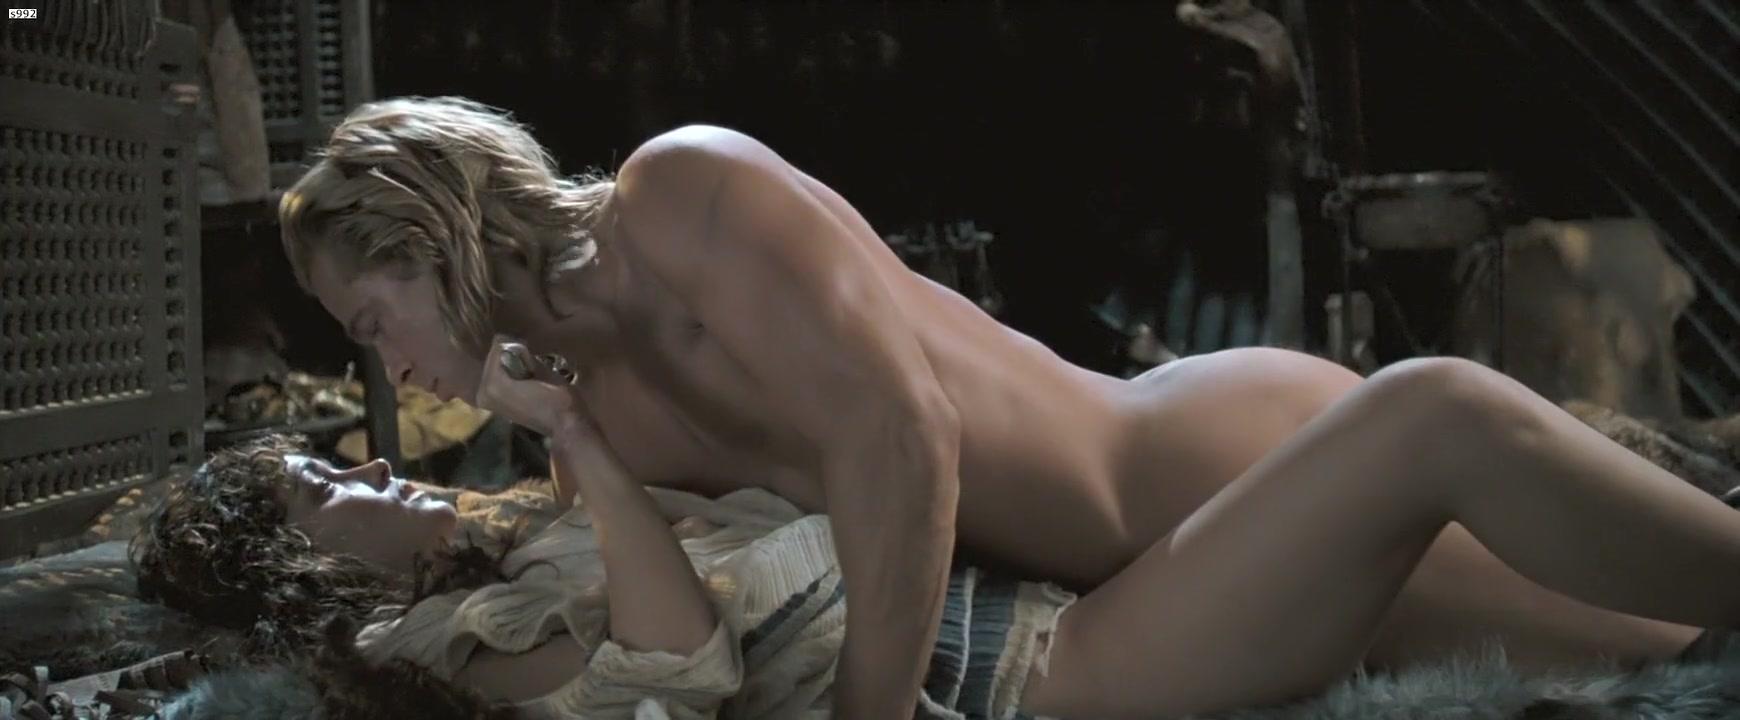 Jockey shorts white cum mobile babe milf Porn FuckBook